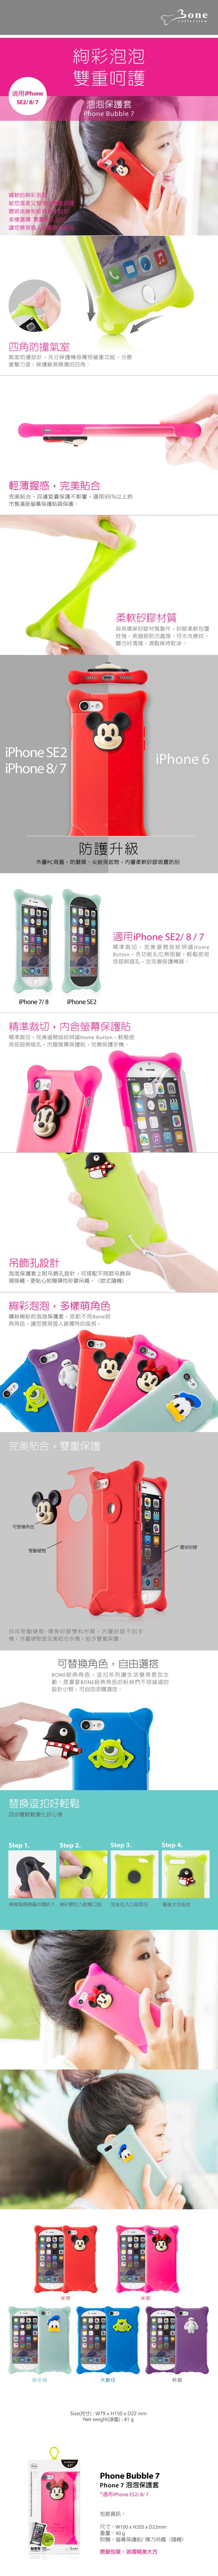 Bone|iPhone SE2 / 8 / 7 四角防撞 泡泡保護套 - 米奇